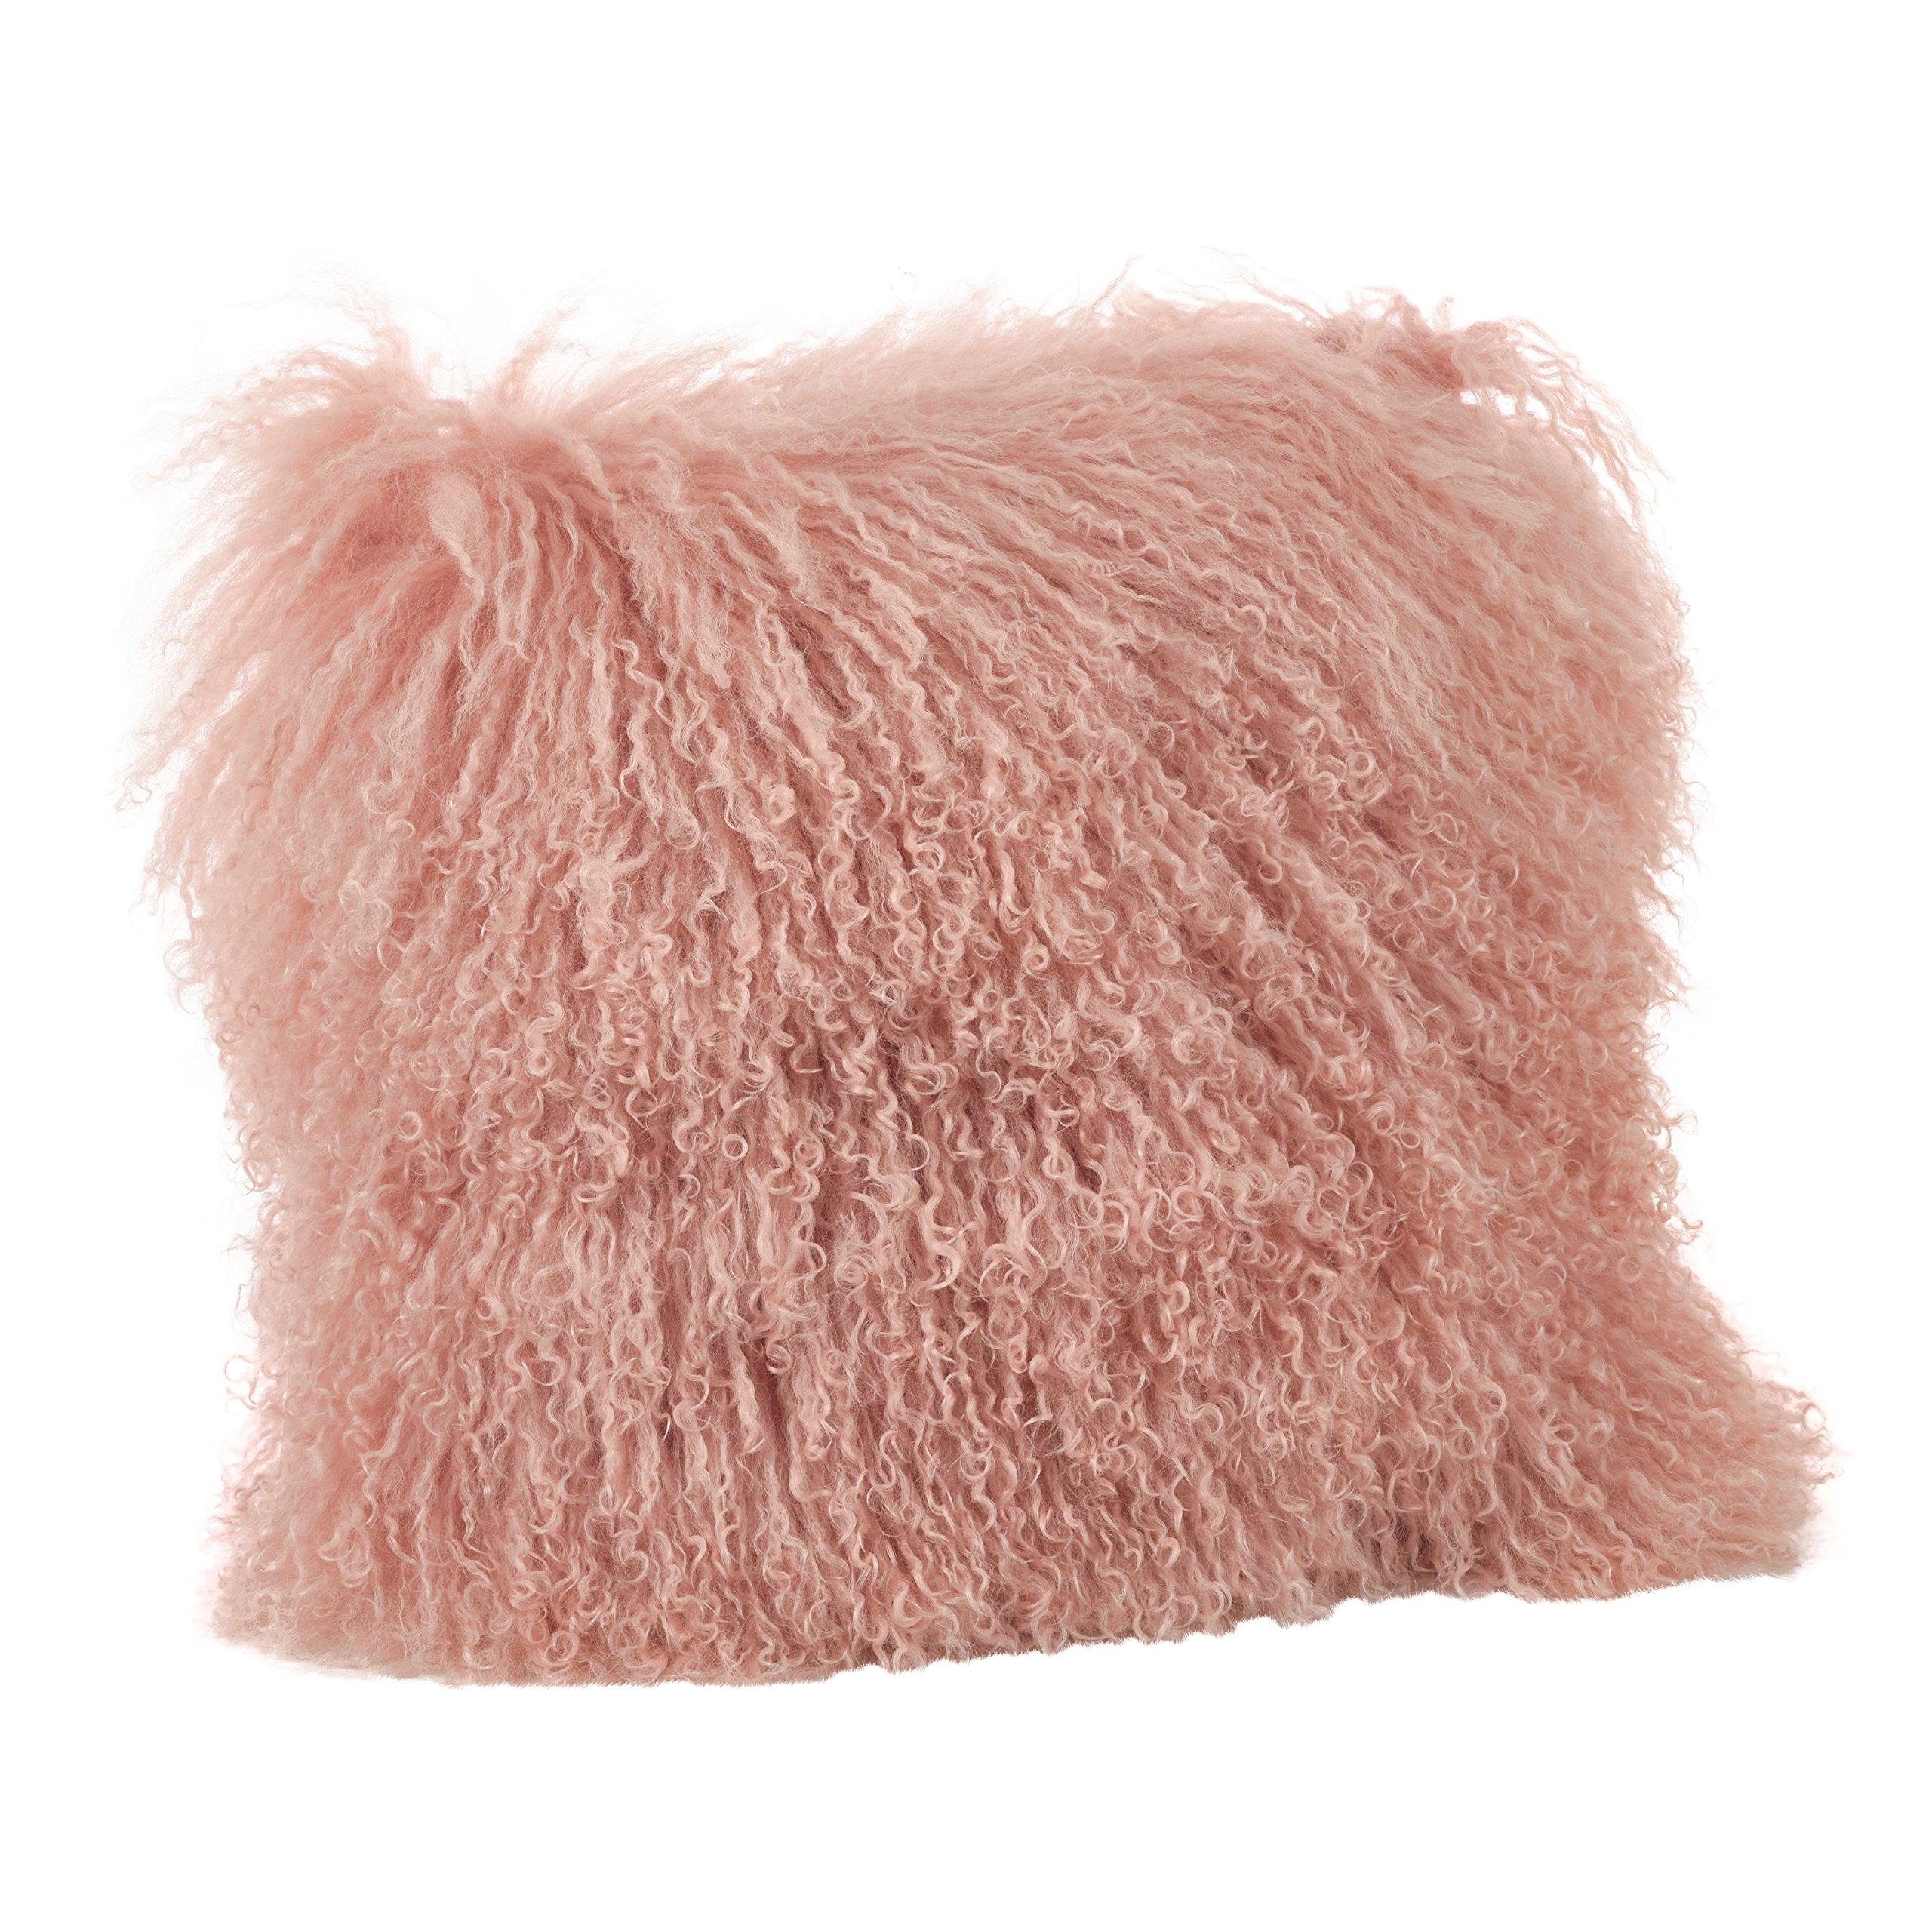 SARO LIFESTYLE Collection Mongolian Lamb Fur Wool Throw Pillow, 20'', Rose by SARO LIFESTYLE